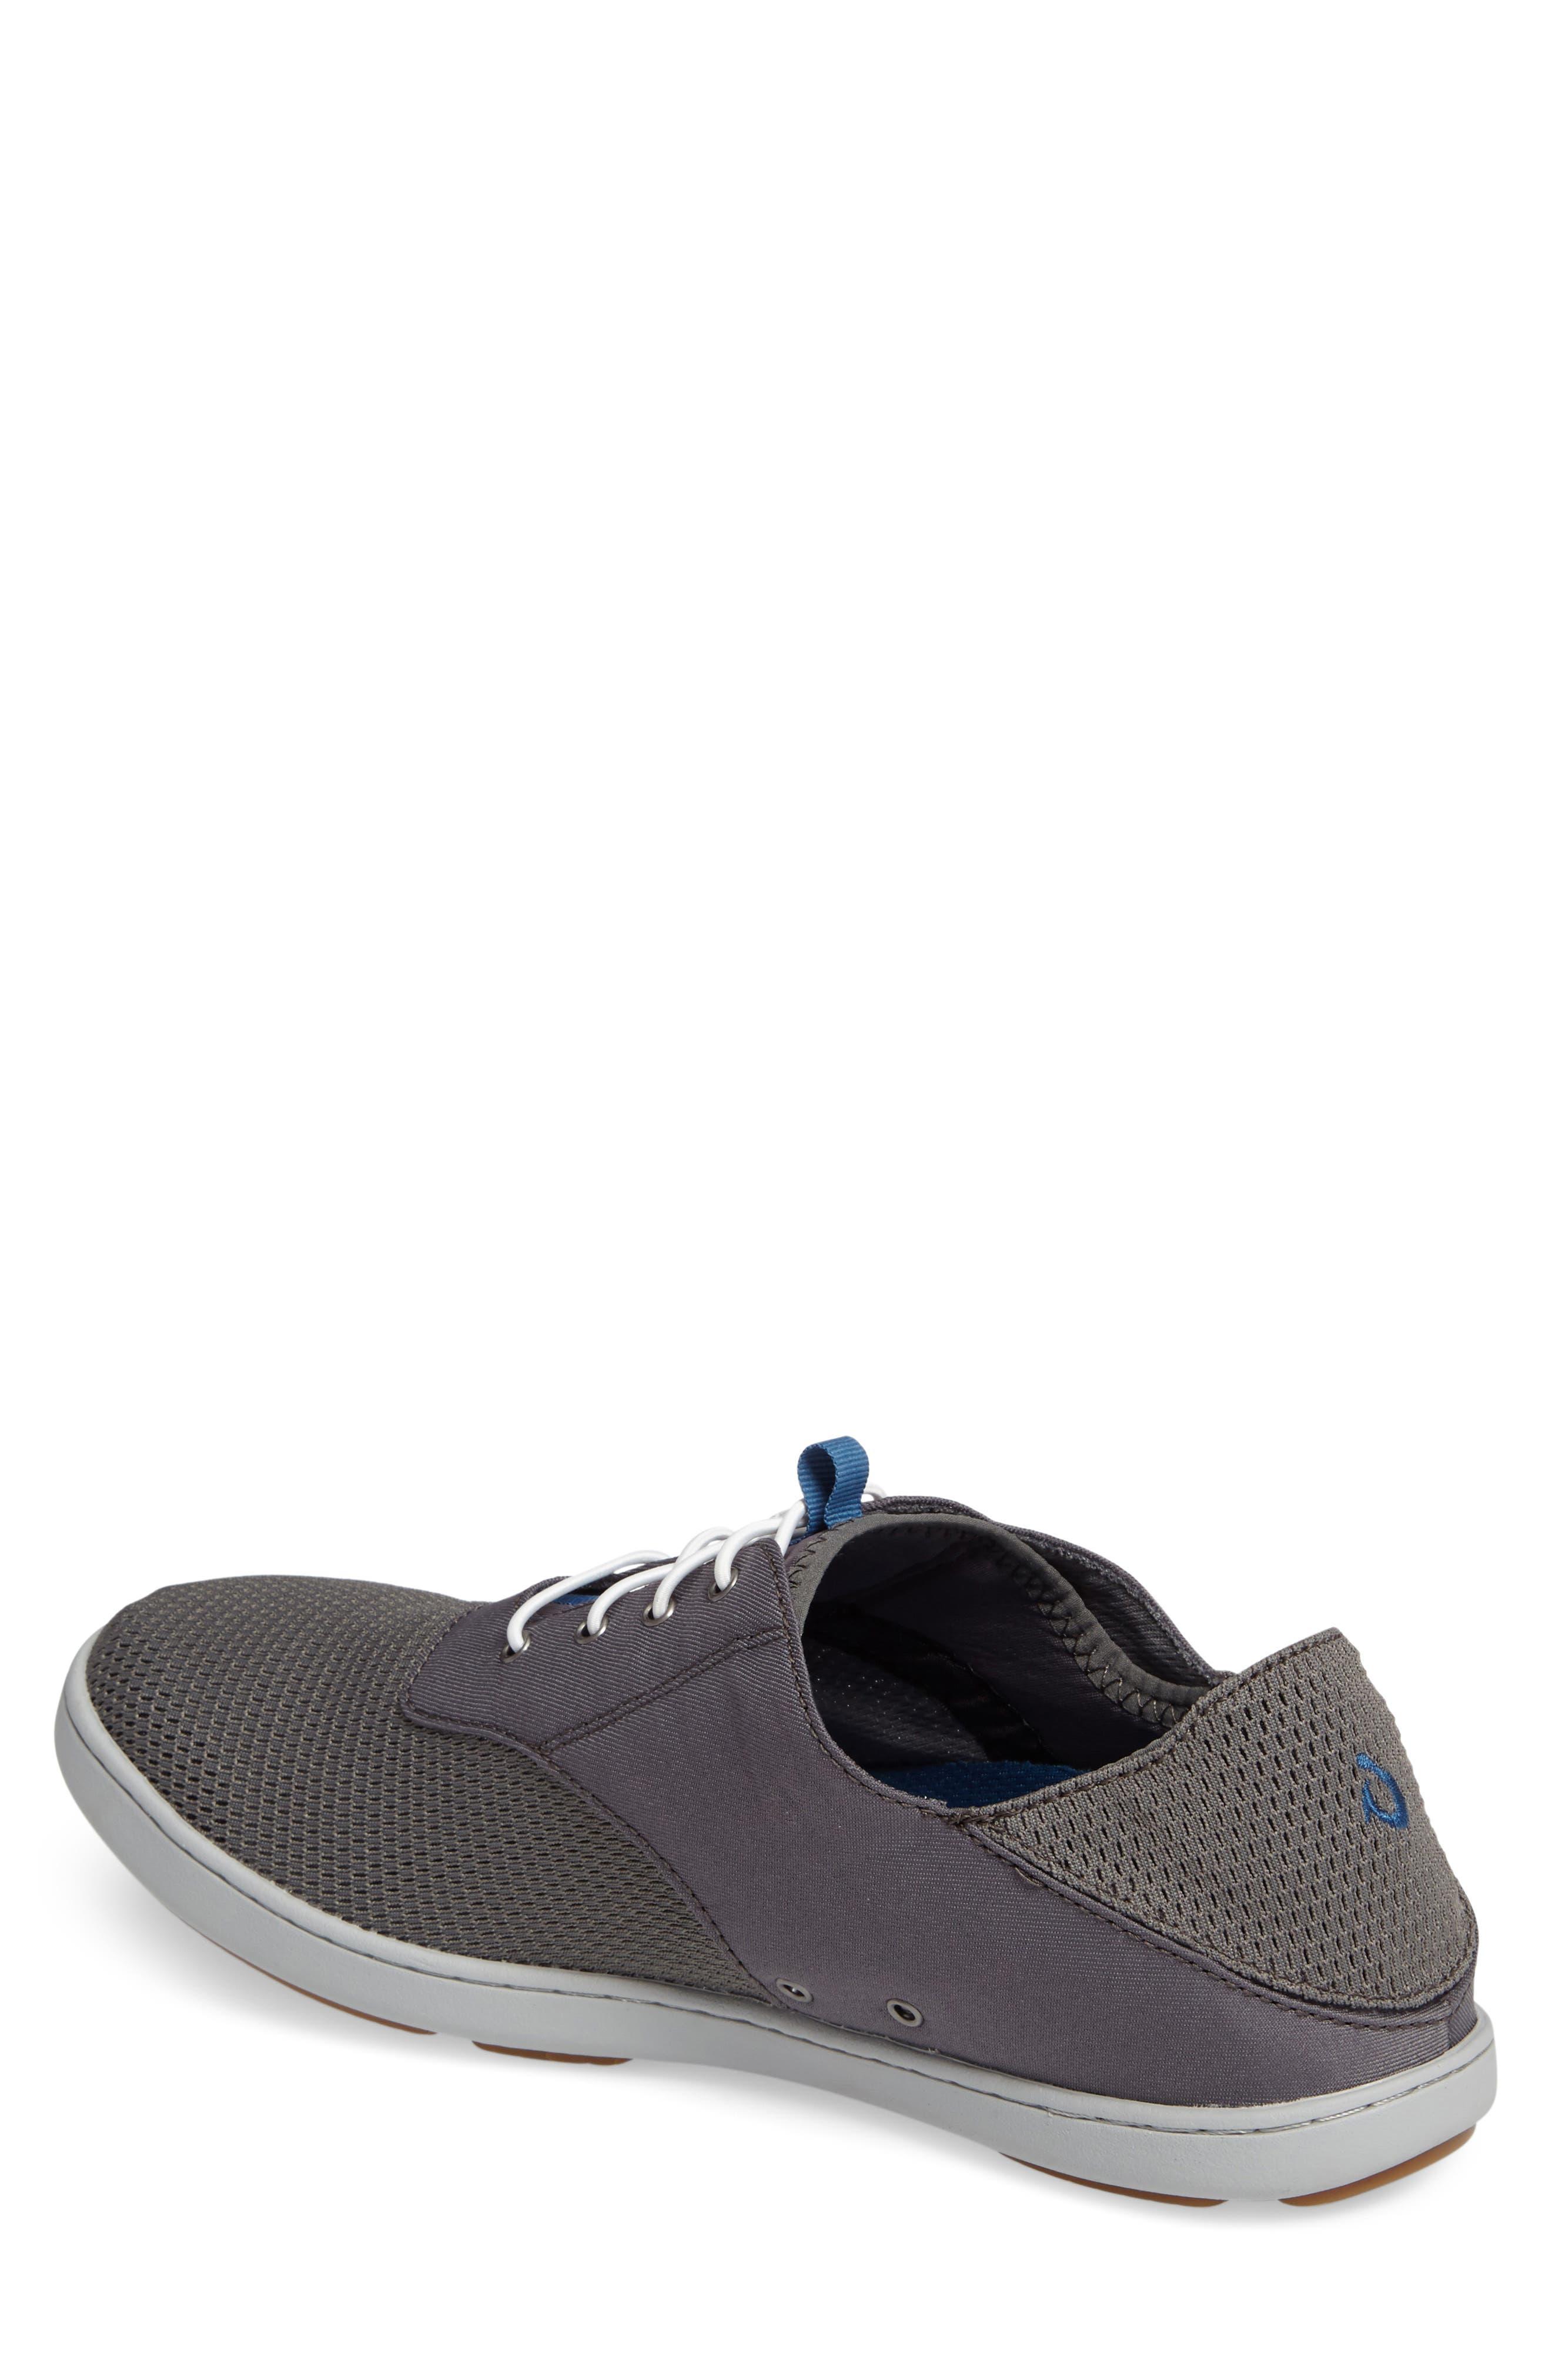 Alternate Image 2  - OluKai 'Nohea Moku' Sneaker (Men)